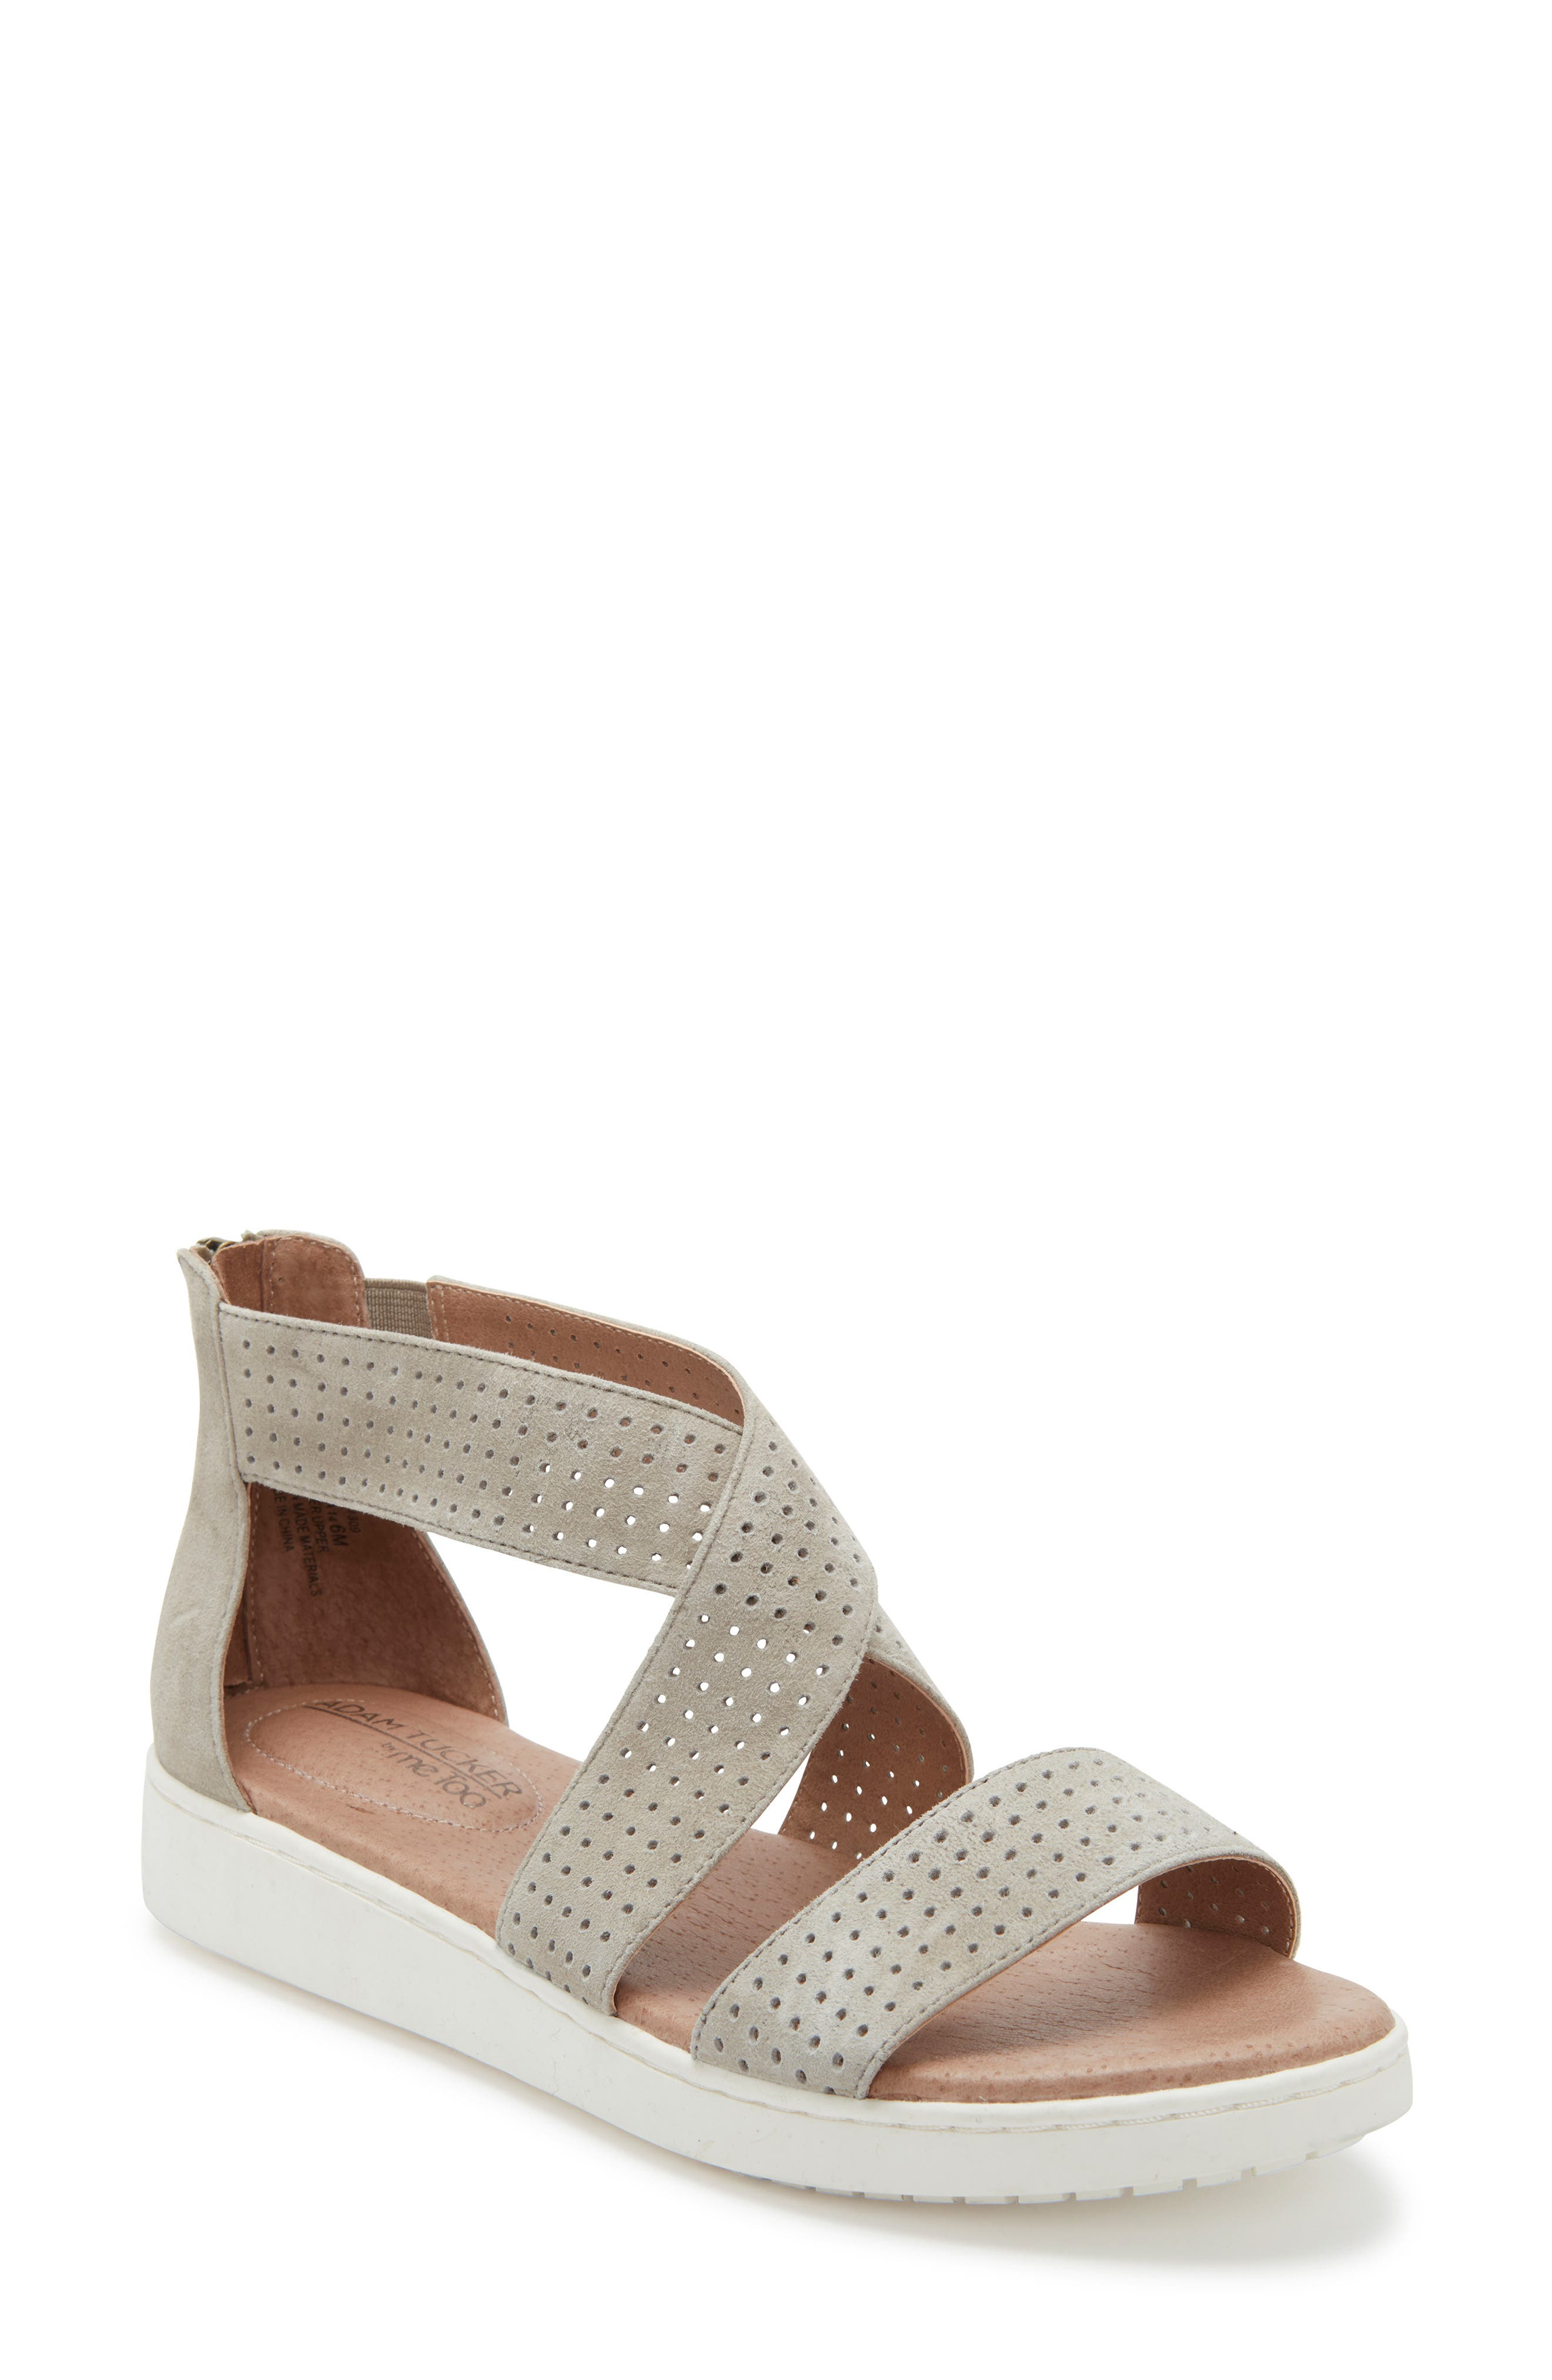 Adam Tucker Rayna Perforated Wedge Sandal- Grey